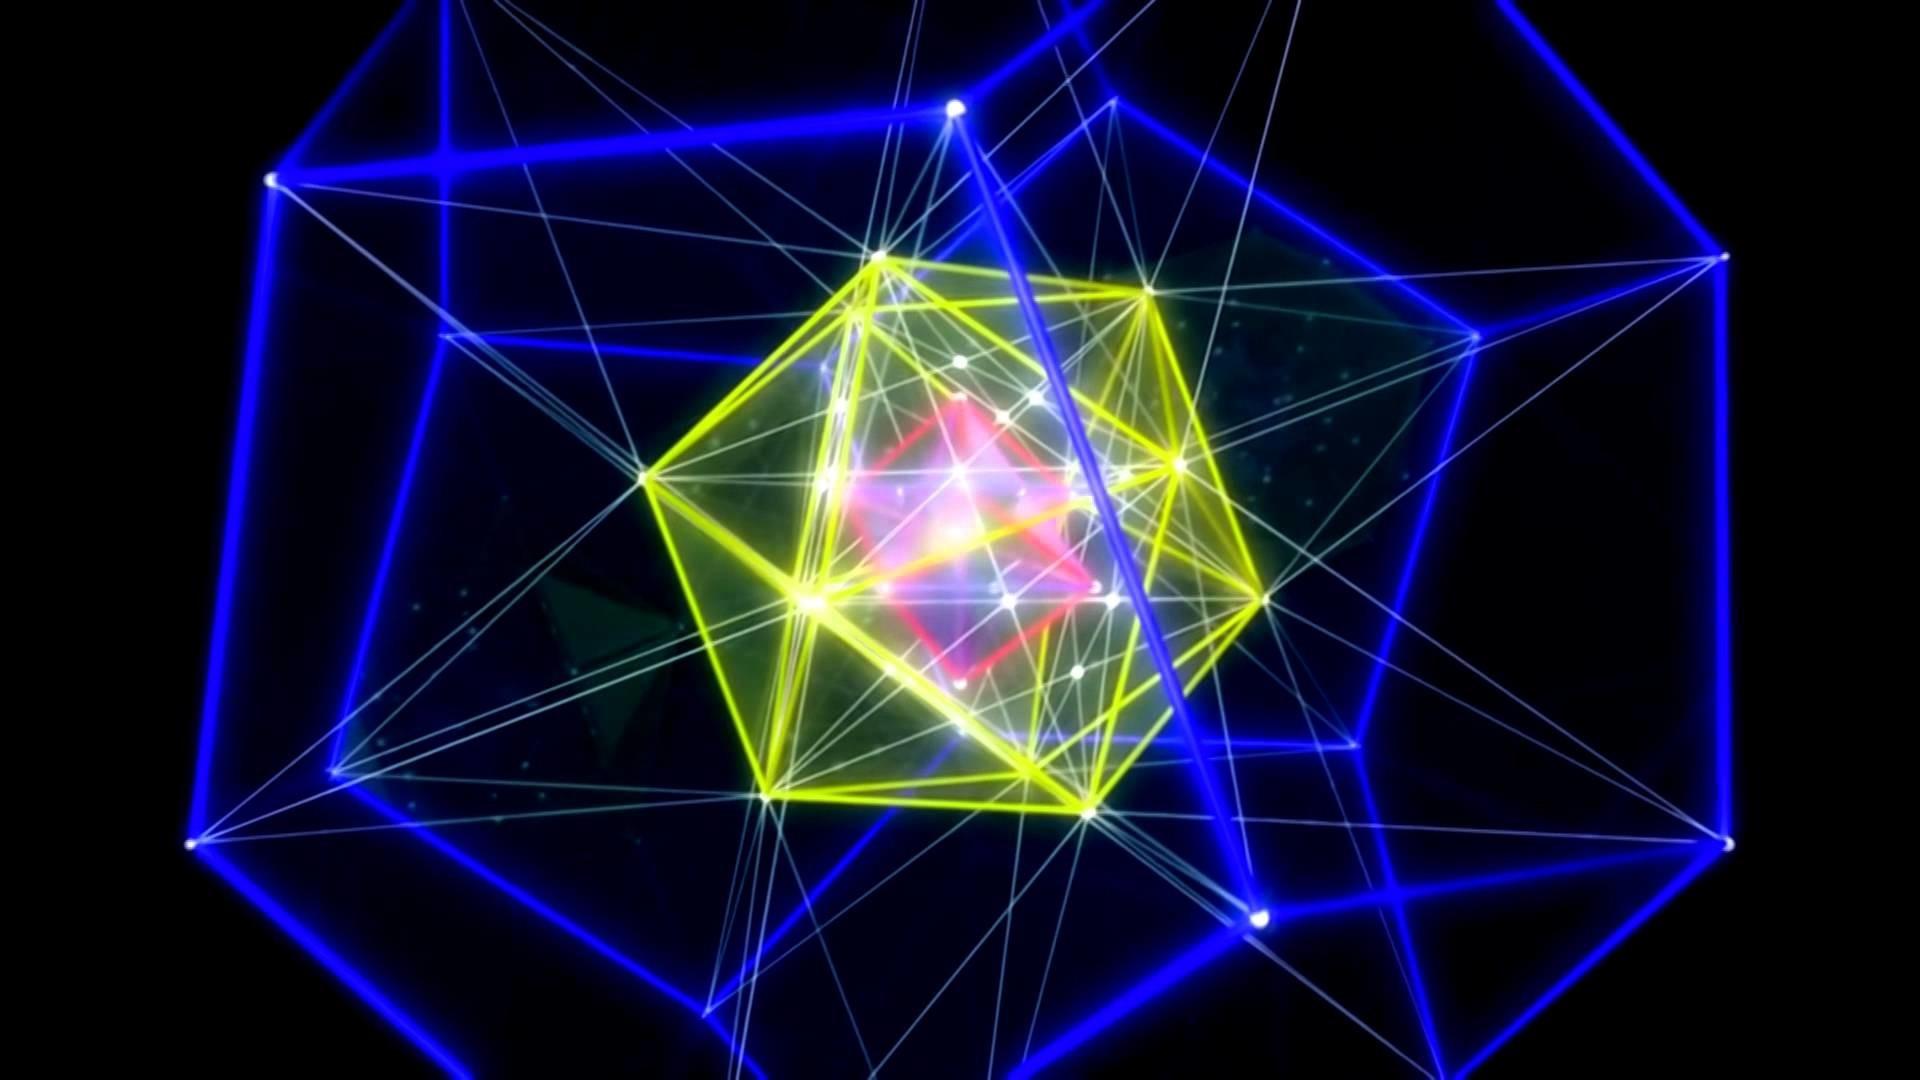 Metatrons Cube Wallpaper (48+ Images